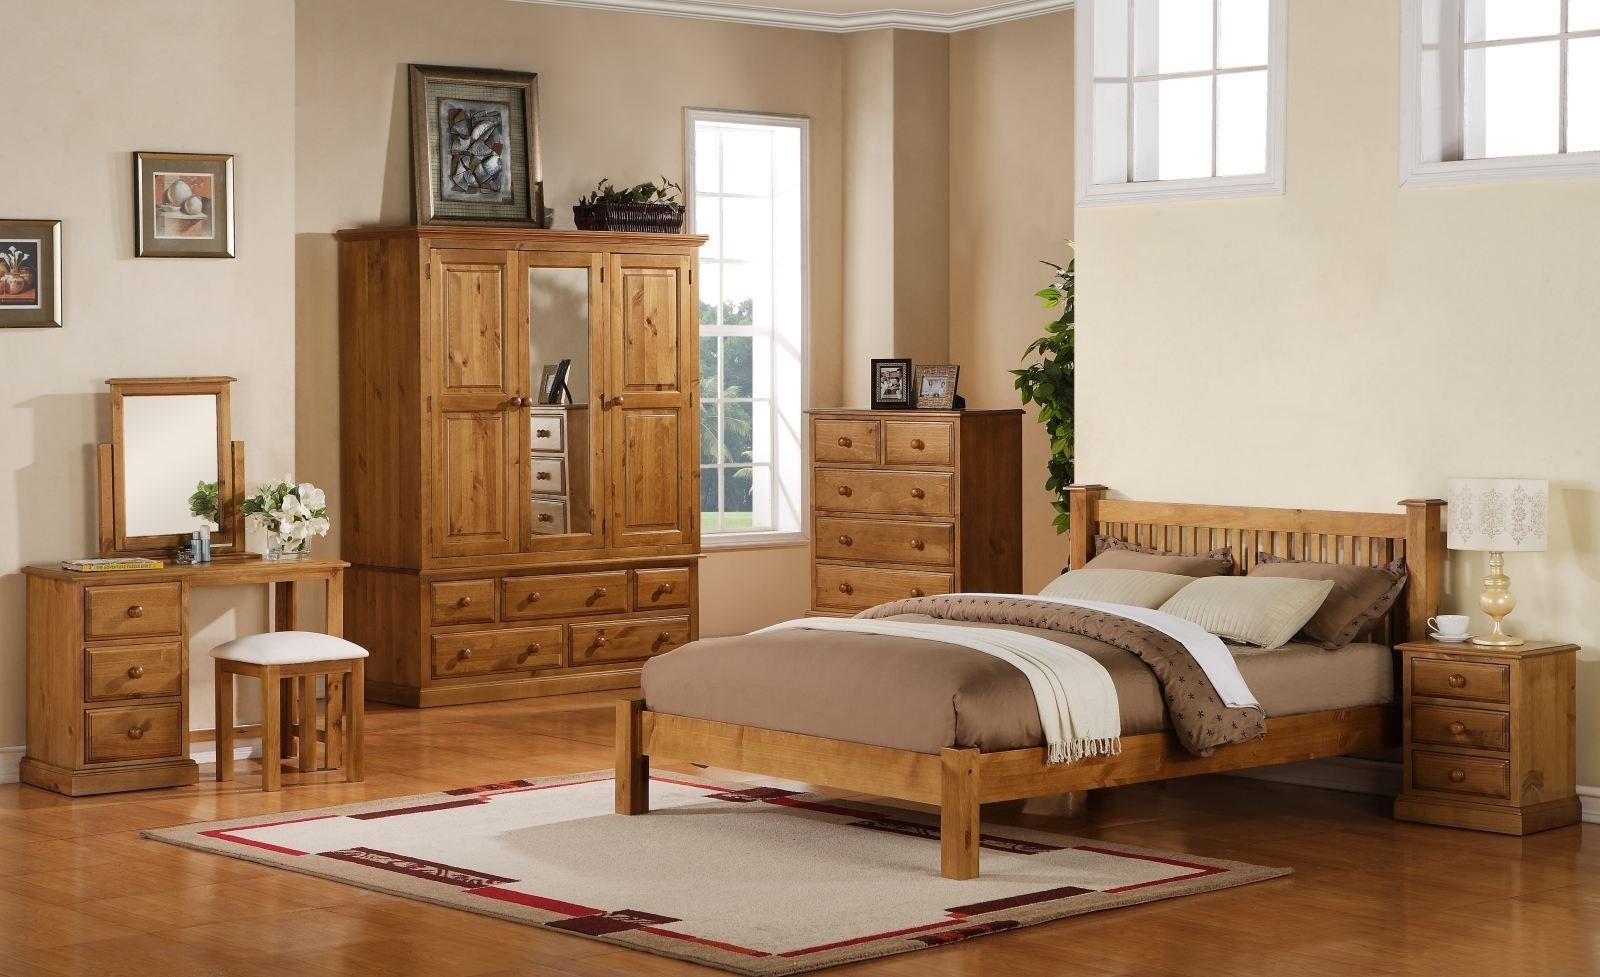 Pine Bedroom Furniture Set White Painted Living Room Furniture Uk Modroxcom